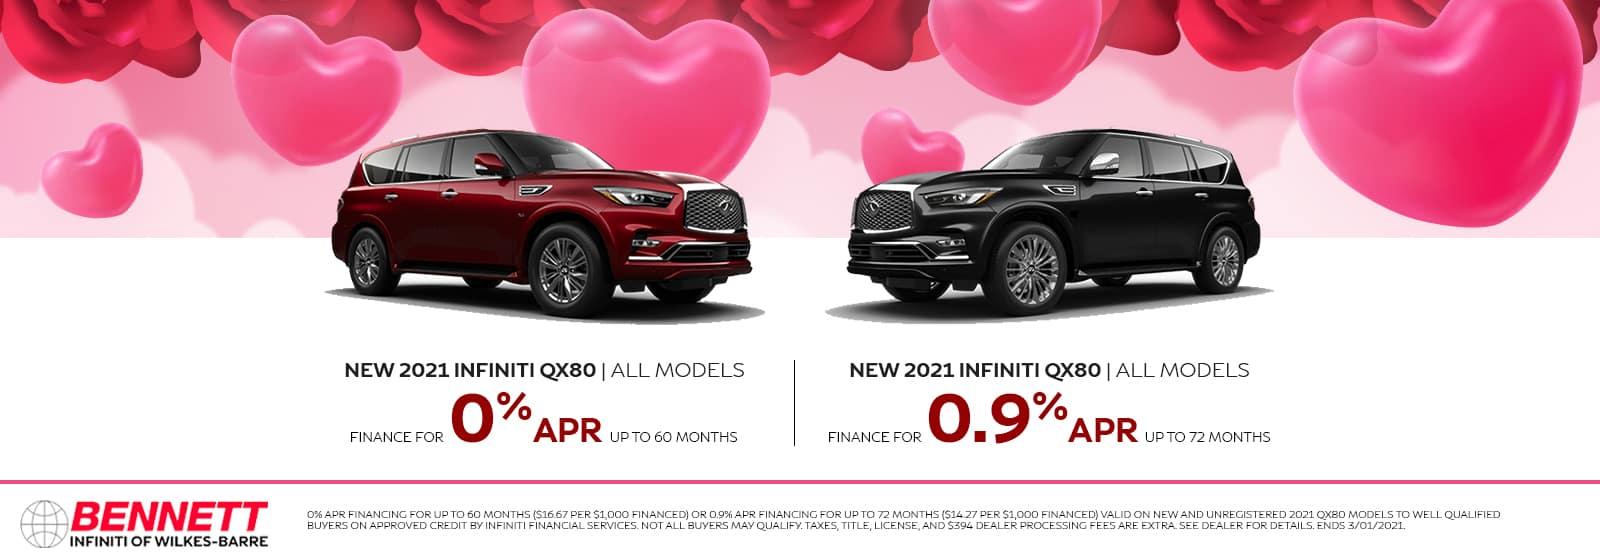 New 2021 INFINITI QX80 (All Models) - Finance for 0% APR up to 60 months or finance for 0.9% APR up to 72 months.